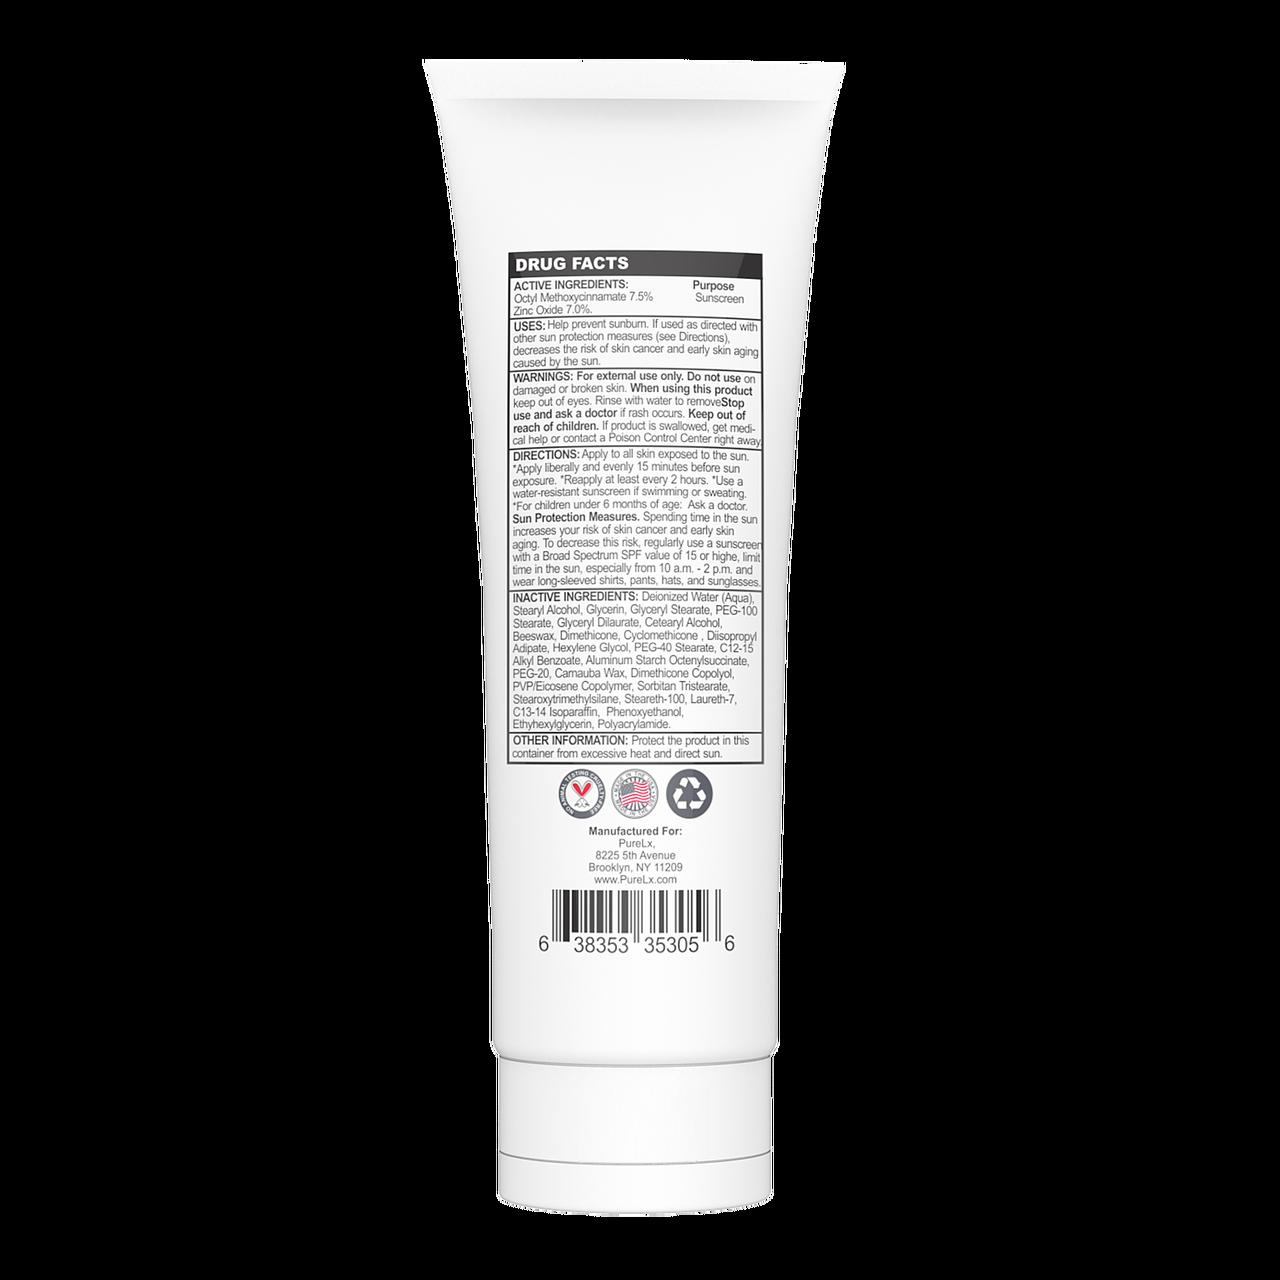 Medium Shade Tinted Moisturizer back panel providing information on the UVB and UVA sunscreen facts